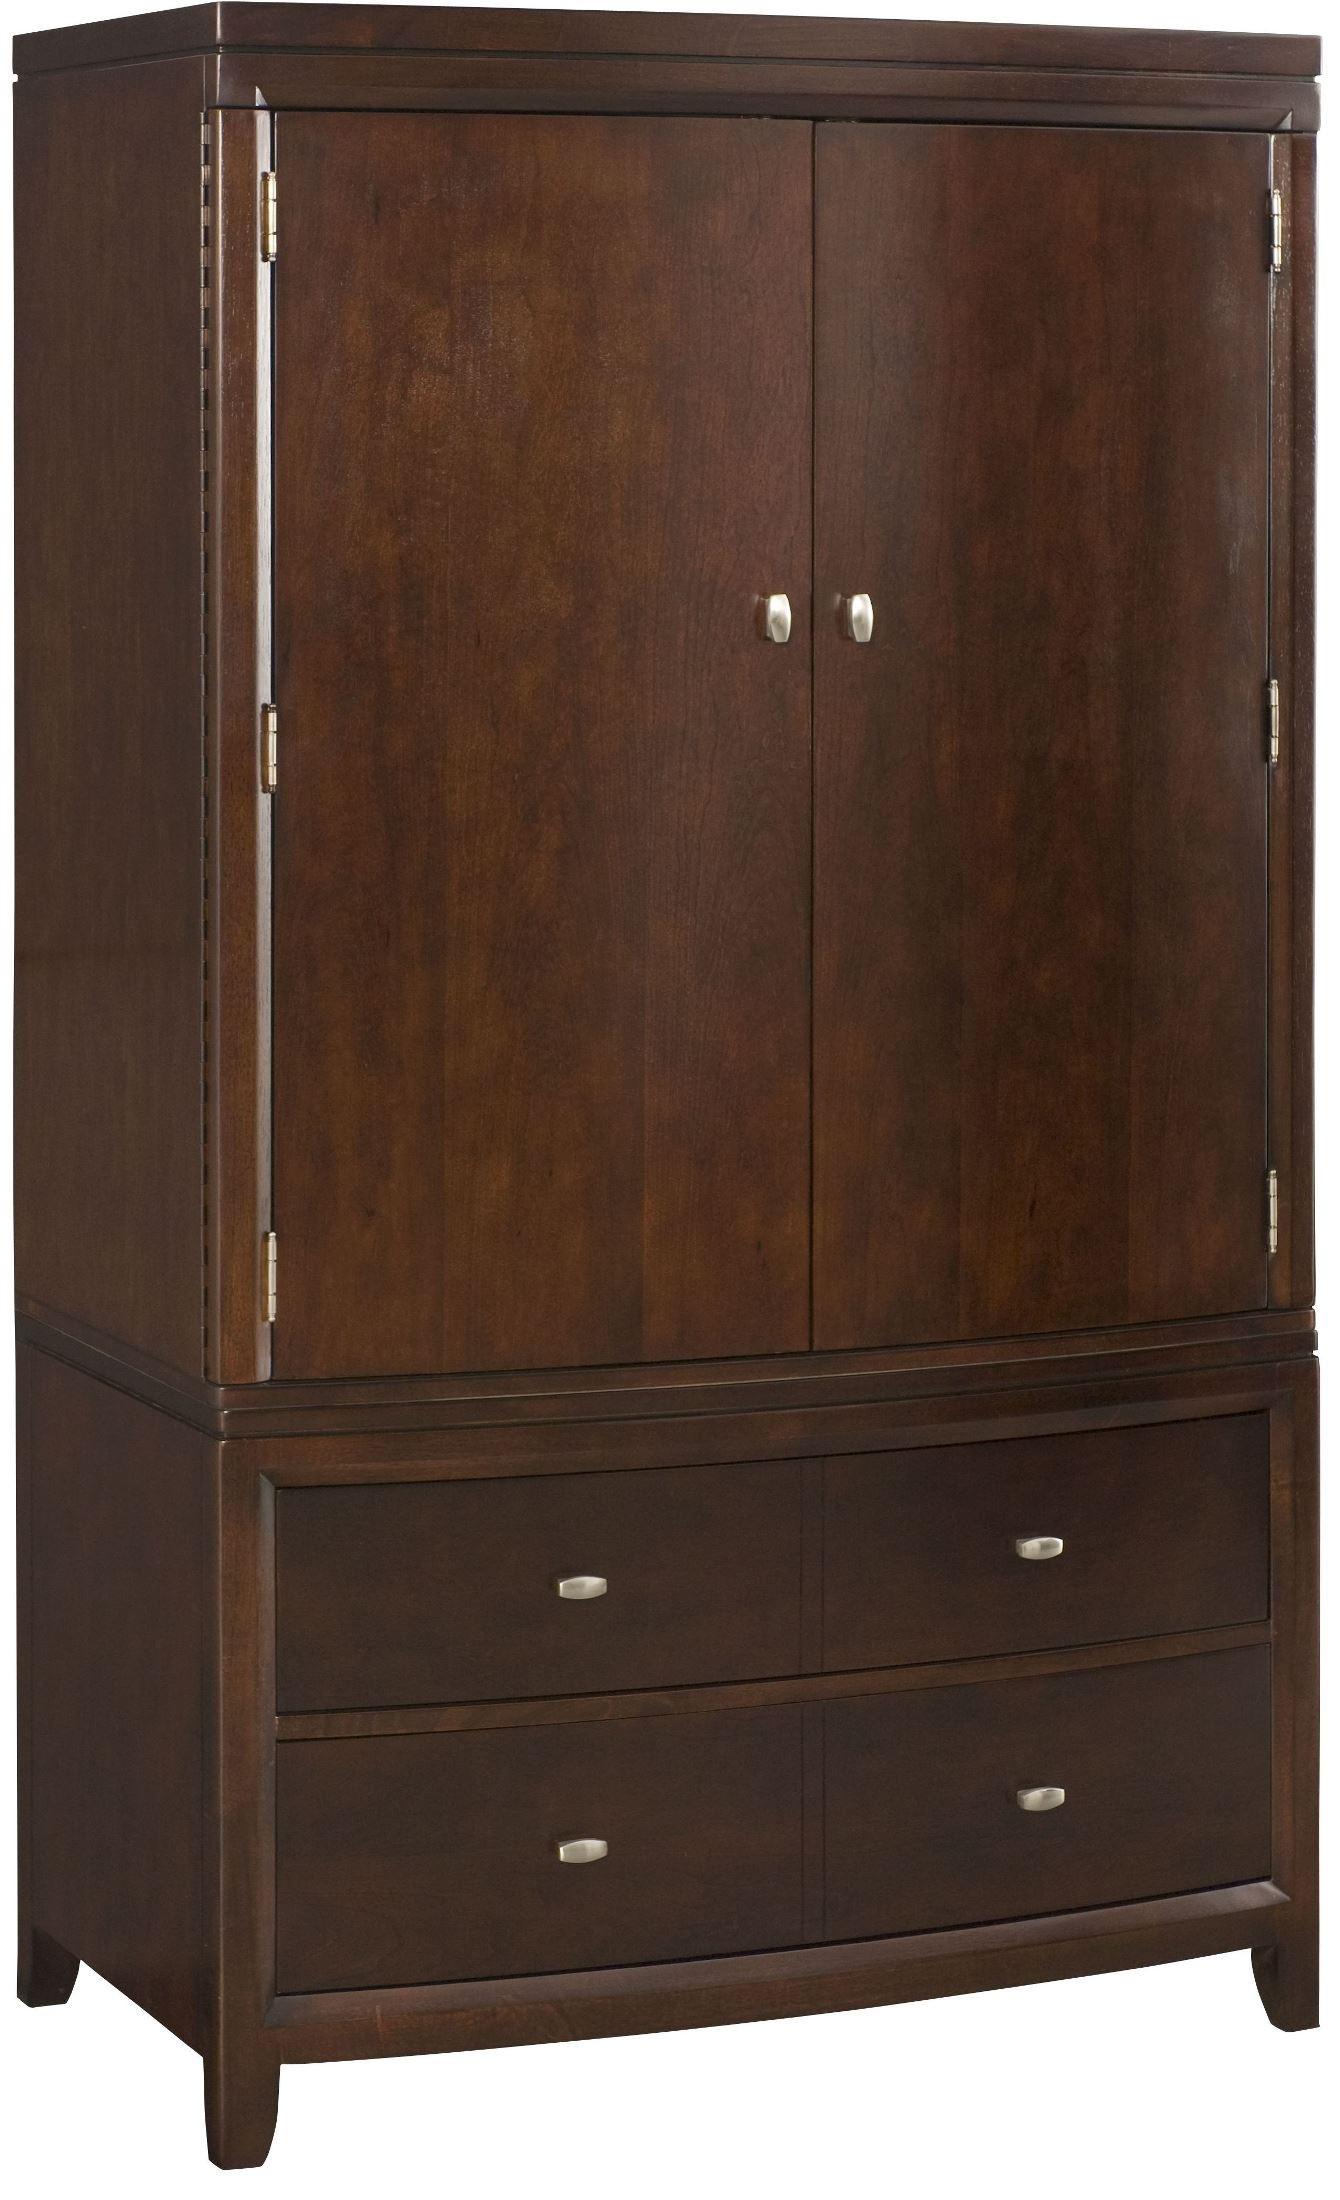 Tribecca Root Beer Slat Bedroom Set From American Drew 912 323r Coleman Furniture